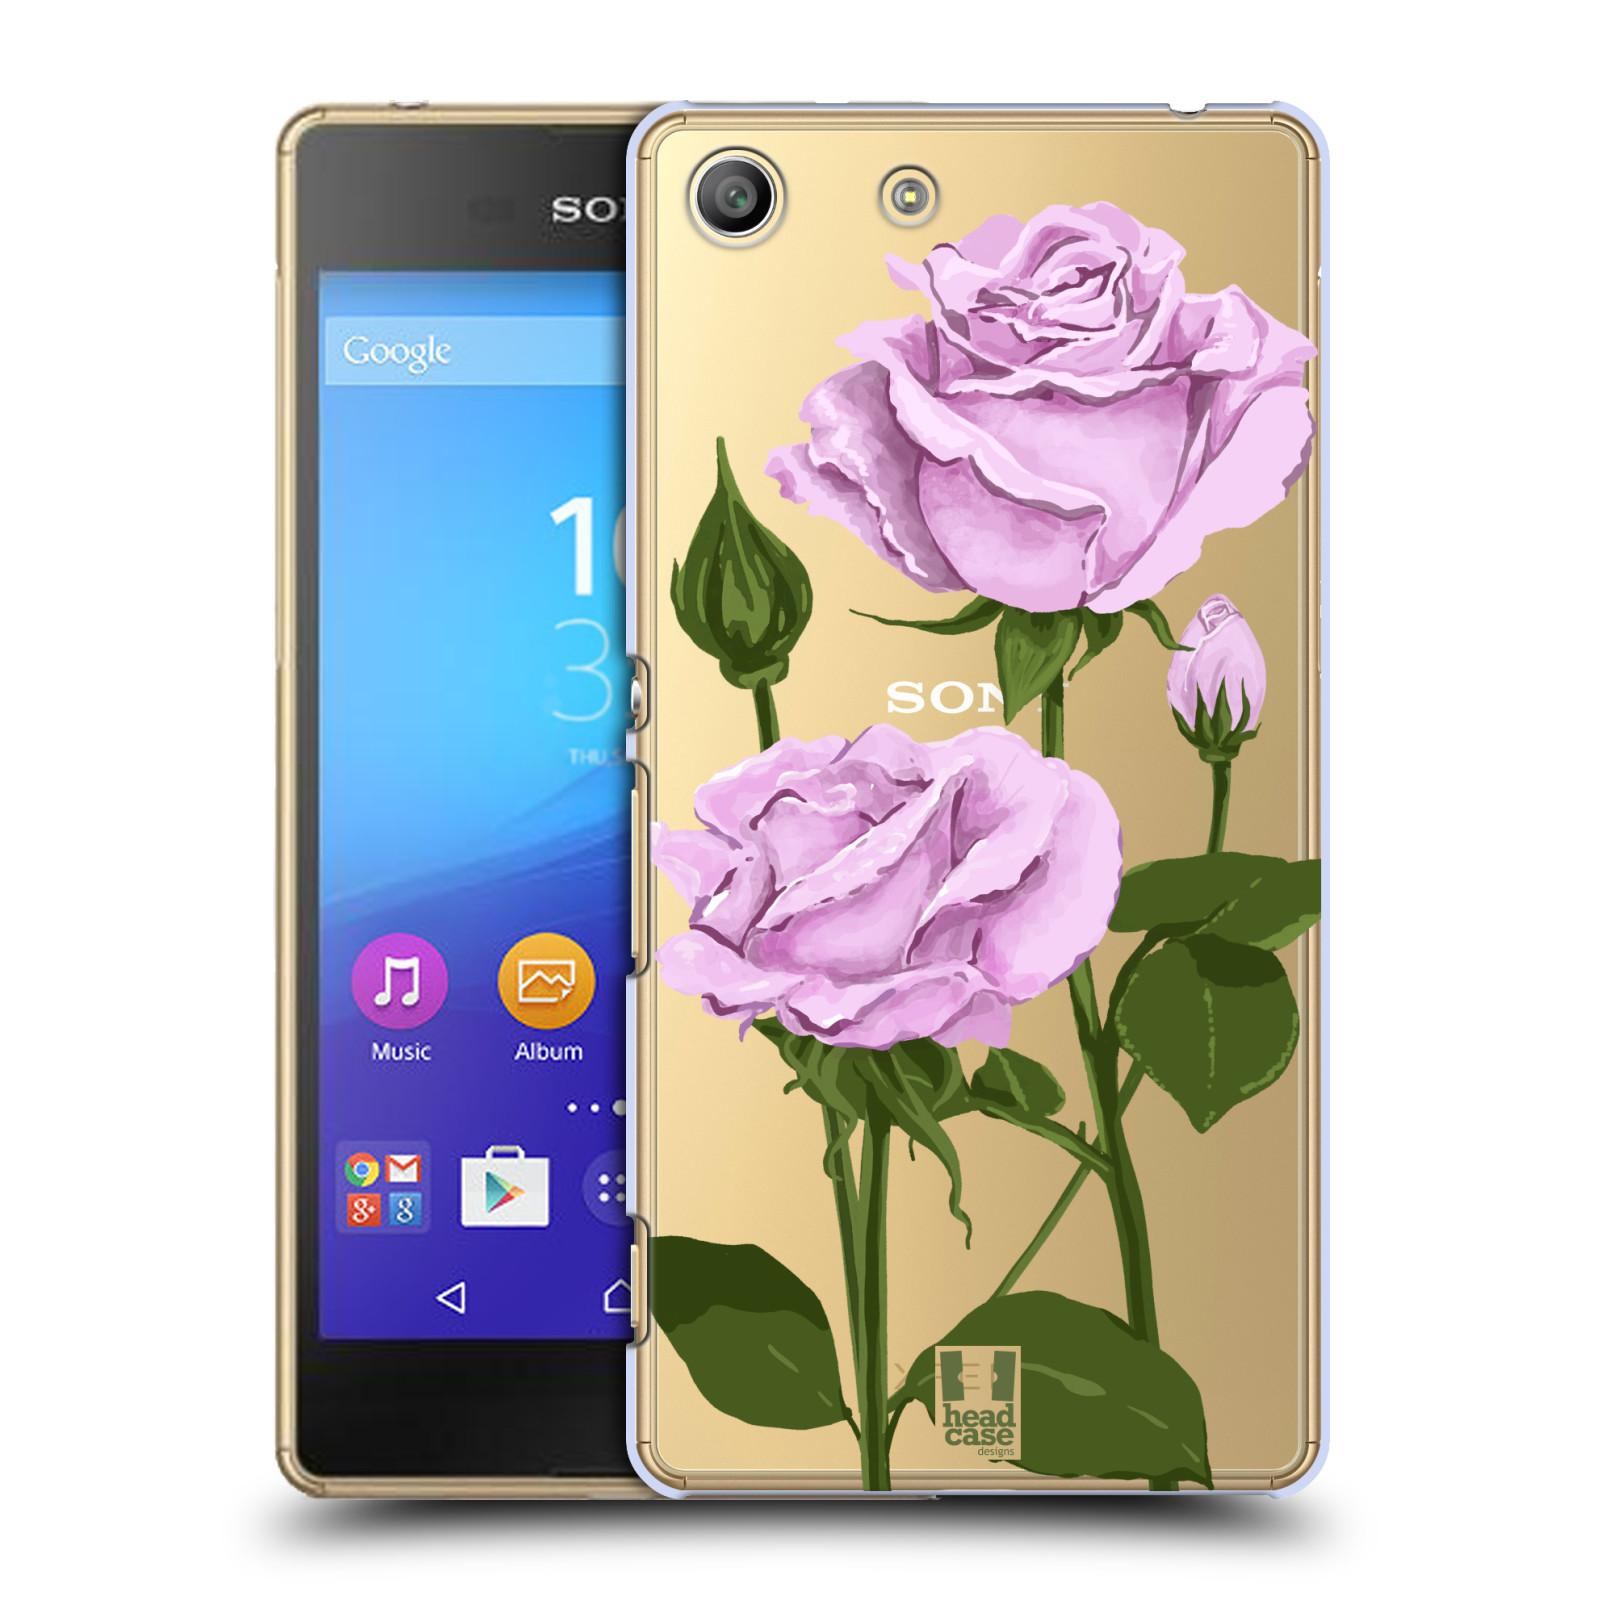 Pouzdro na mobil Sony Xperia M5 - HEAD CASE - květina růže růžová